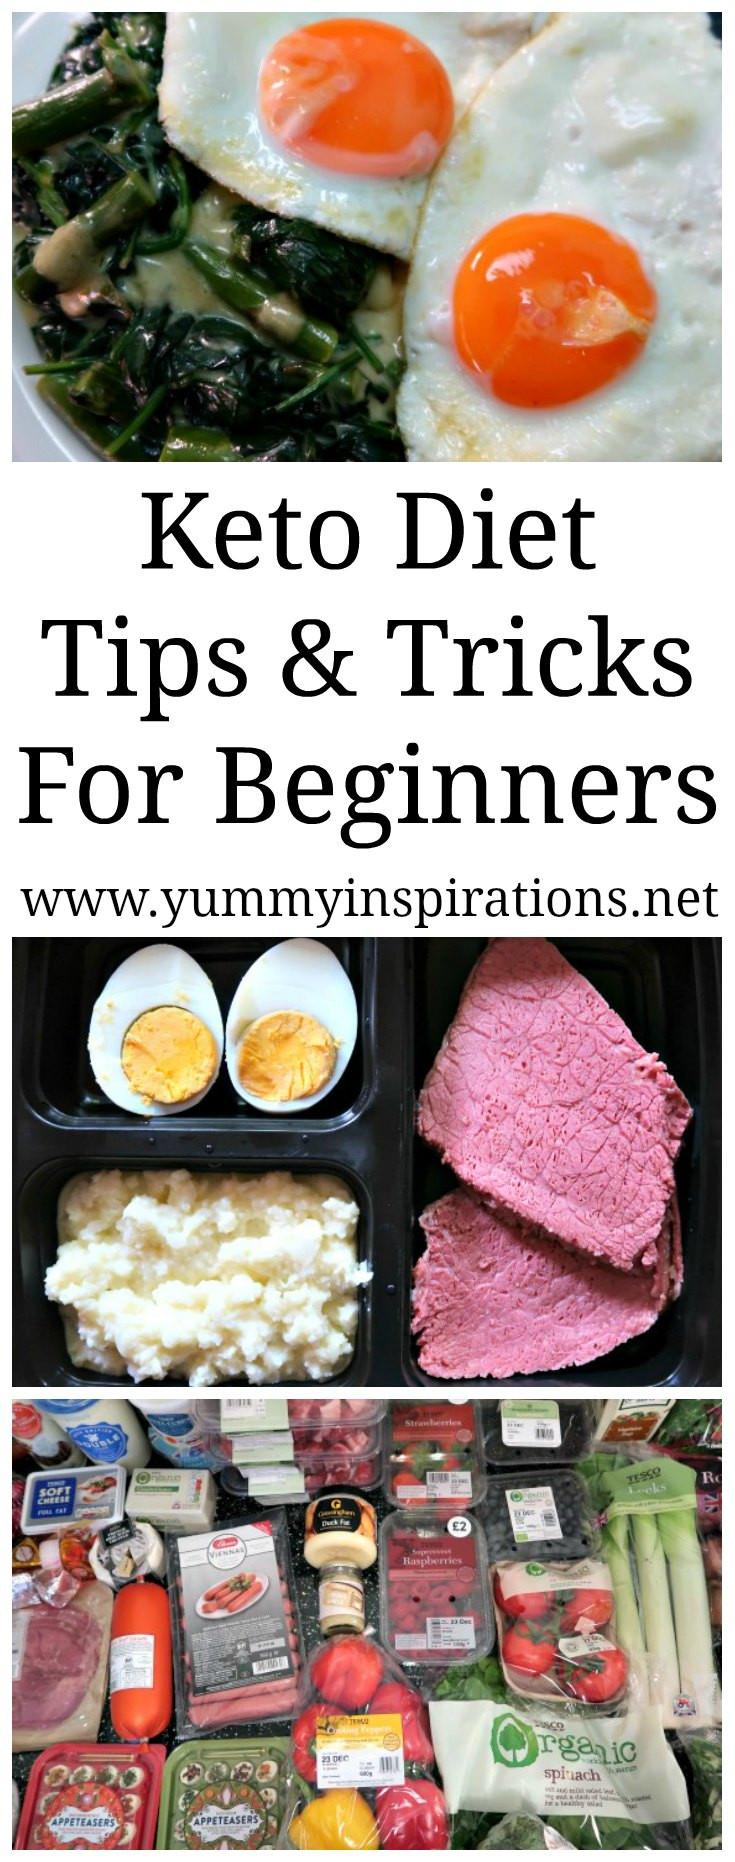 Keto Diet For Beginners Losing Weight Snacks  Keto Tips For Beginners Tips and Tricks for Ketogenic